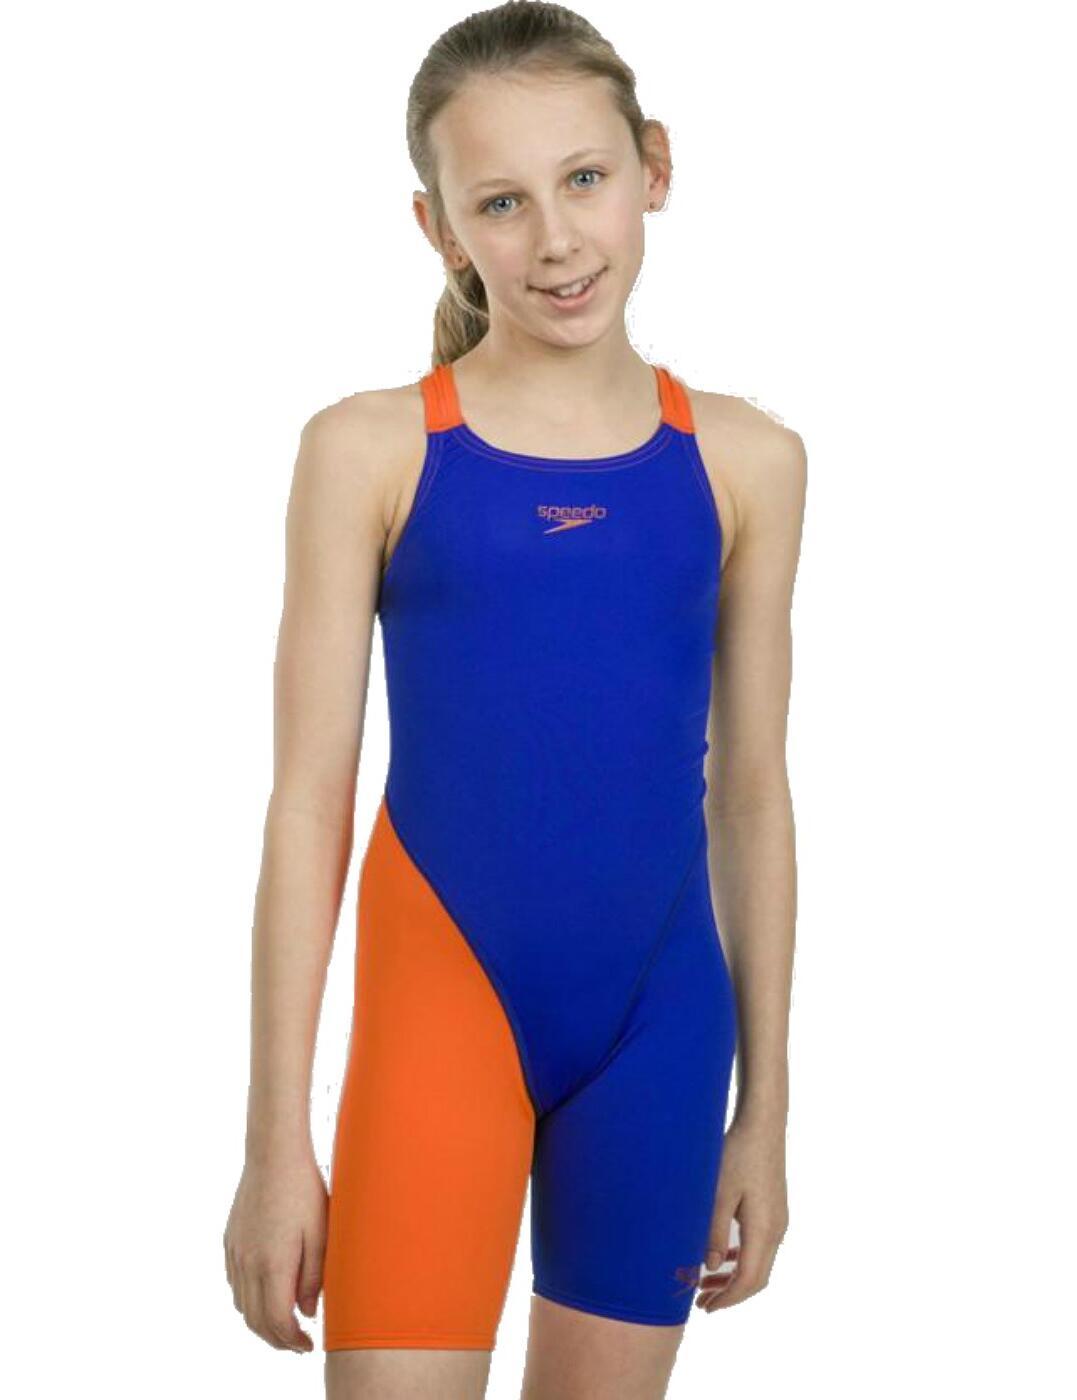 Openback Kneeskin 809732C611 Blue//Orange Speedo Children/'s Fastskin Endurance